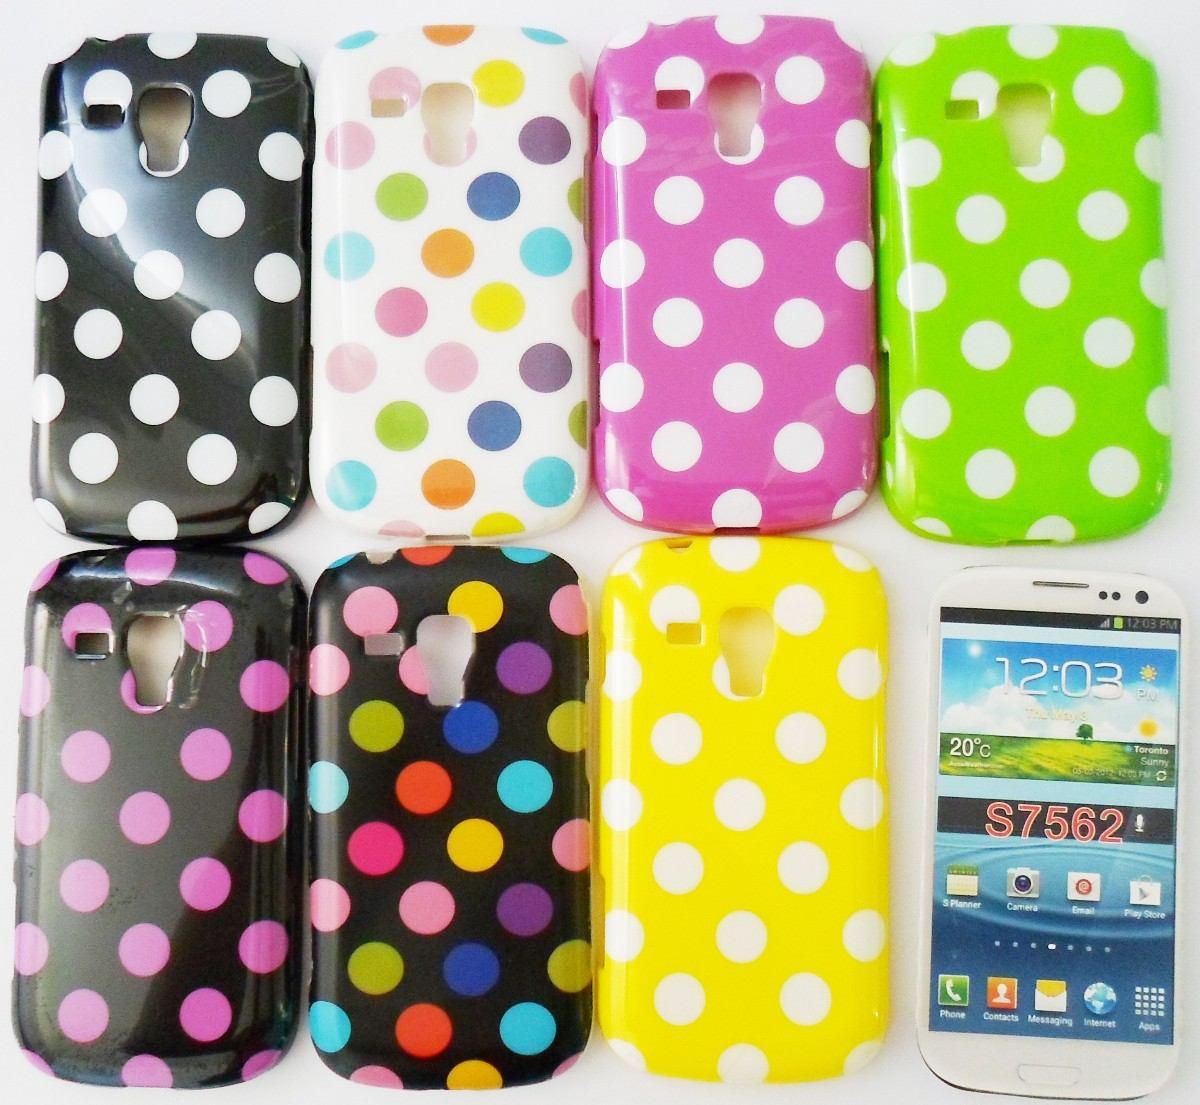 Pin Capa Galaxy Grand Duos Lilás Premium Samsung I9082 on Pinterest